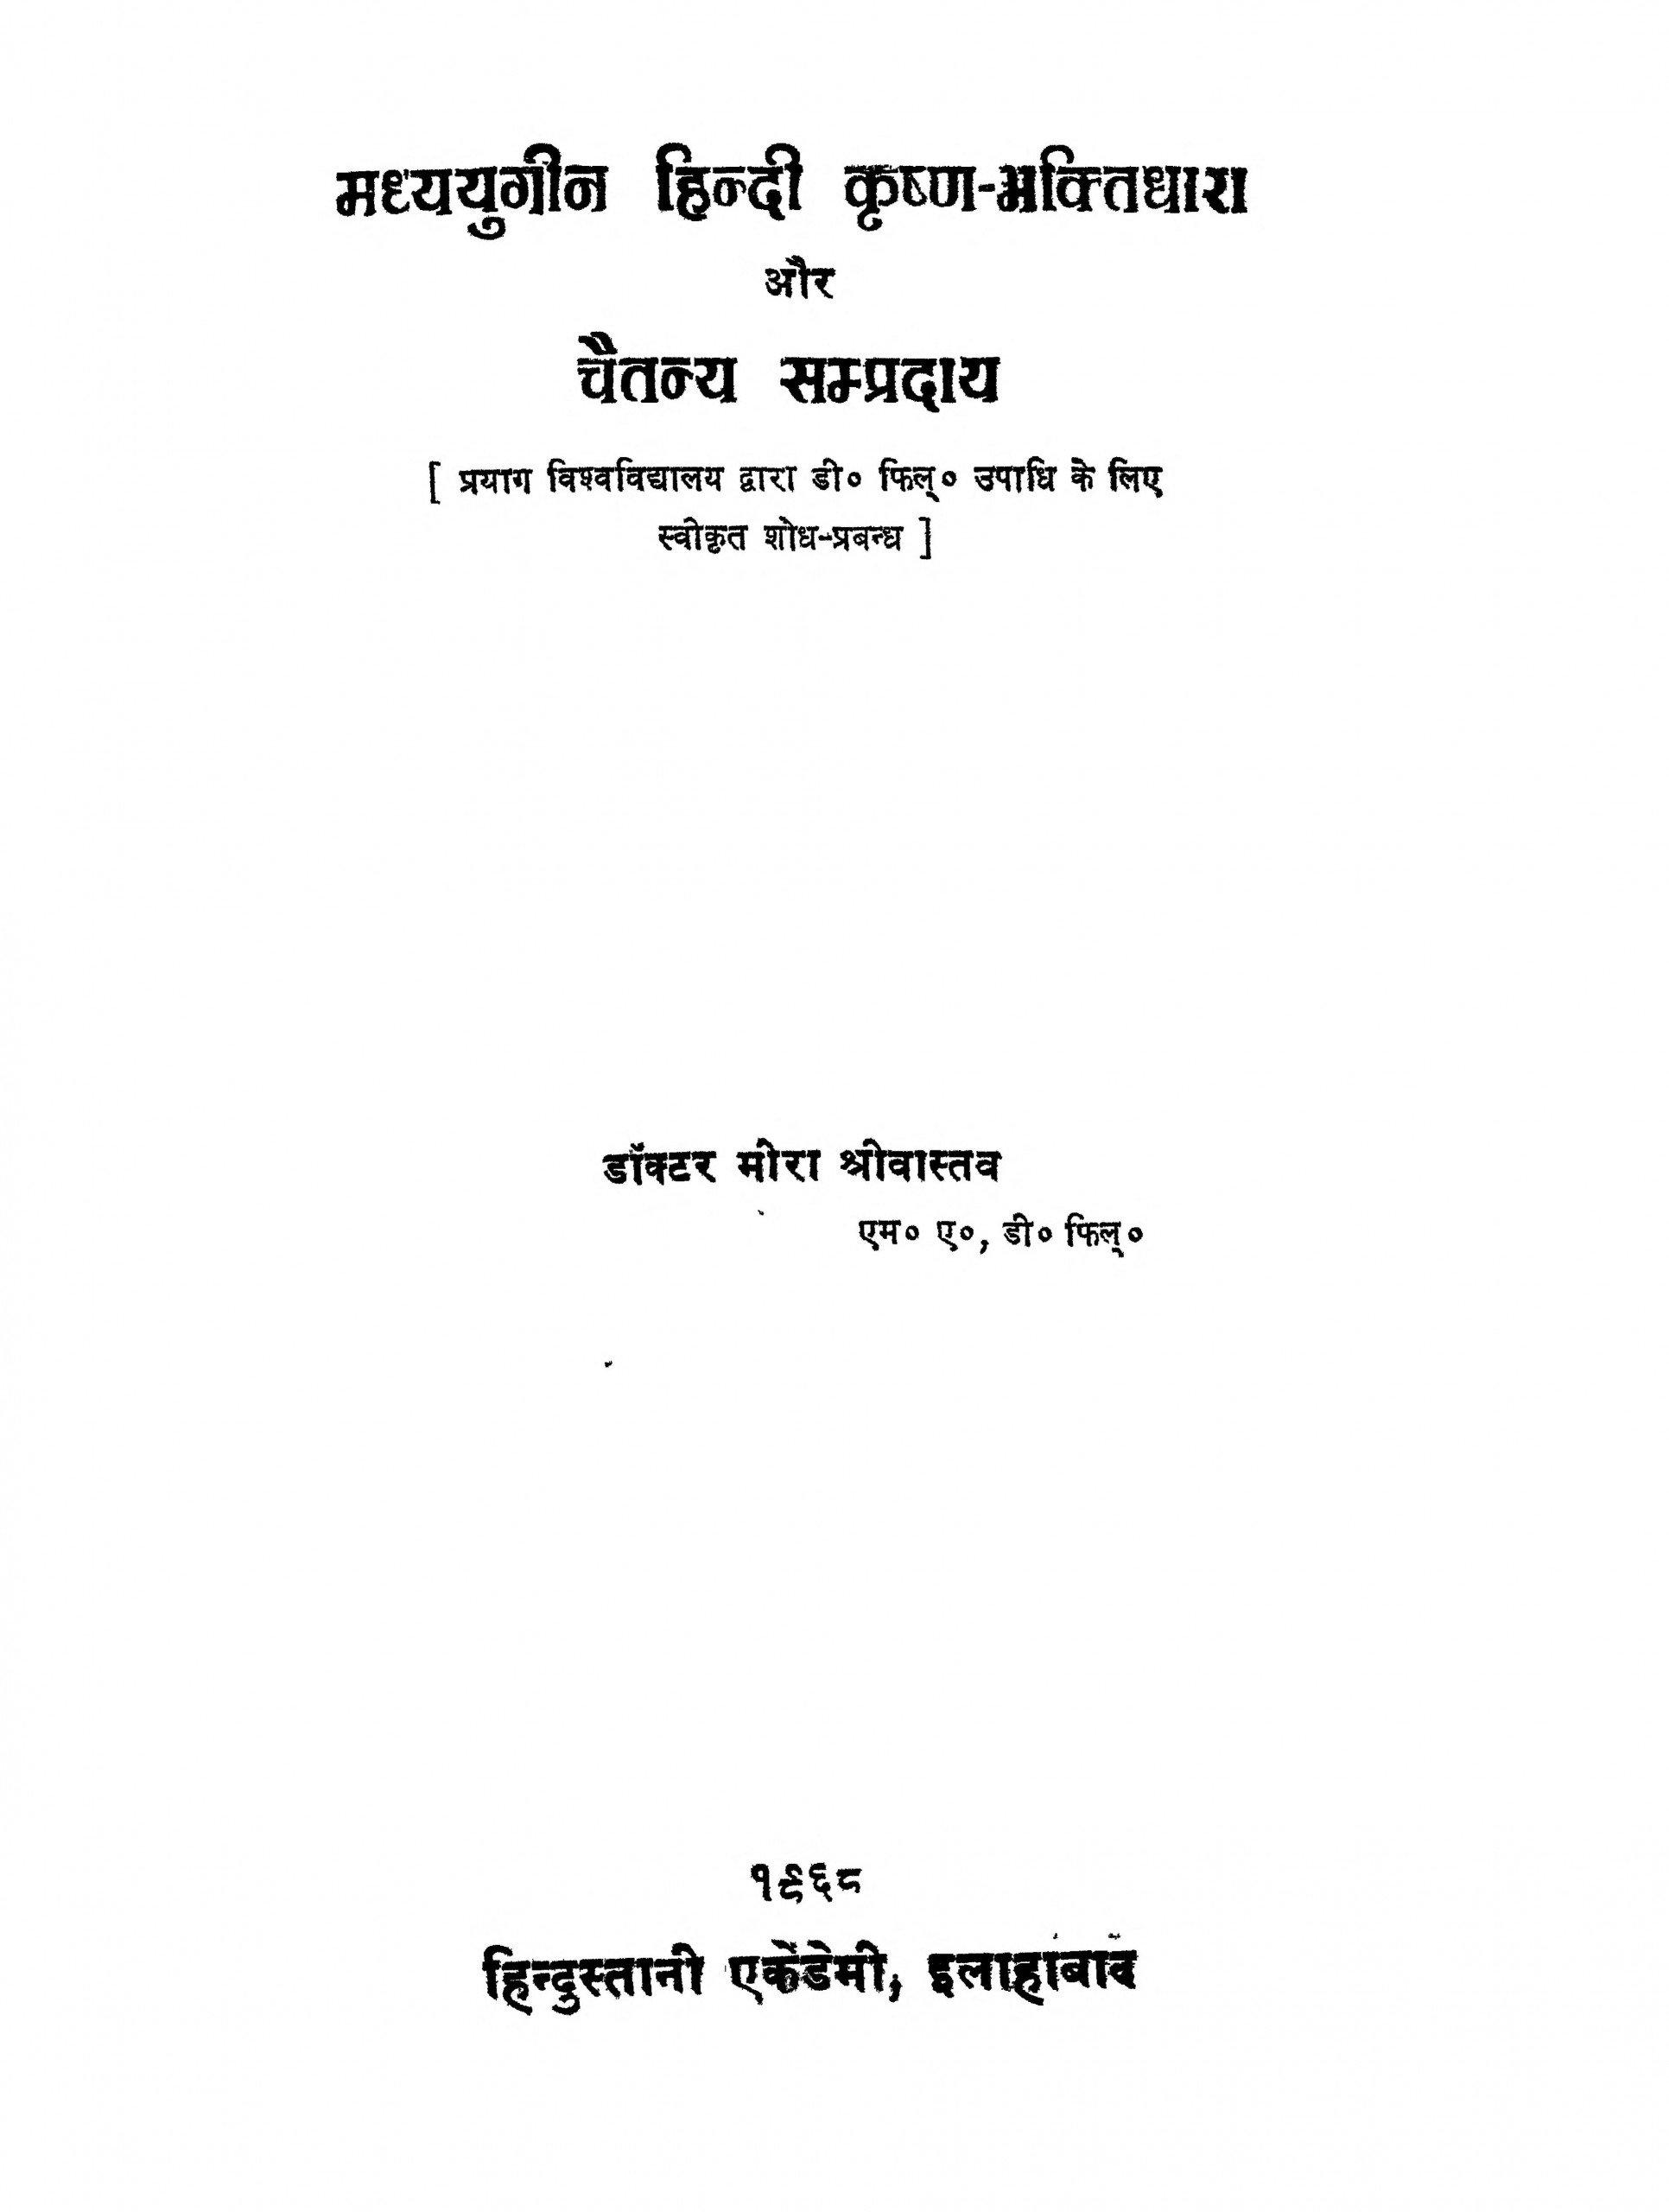 Book Image : मध्ययुगीन हिंदी कृष्ण भक्तिधारा और चैतन्य सम्प्रदाय  - Madhyayugeen Hindi Krishna Bhaktidhara Aur Chaitanya Sampraday